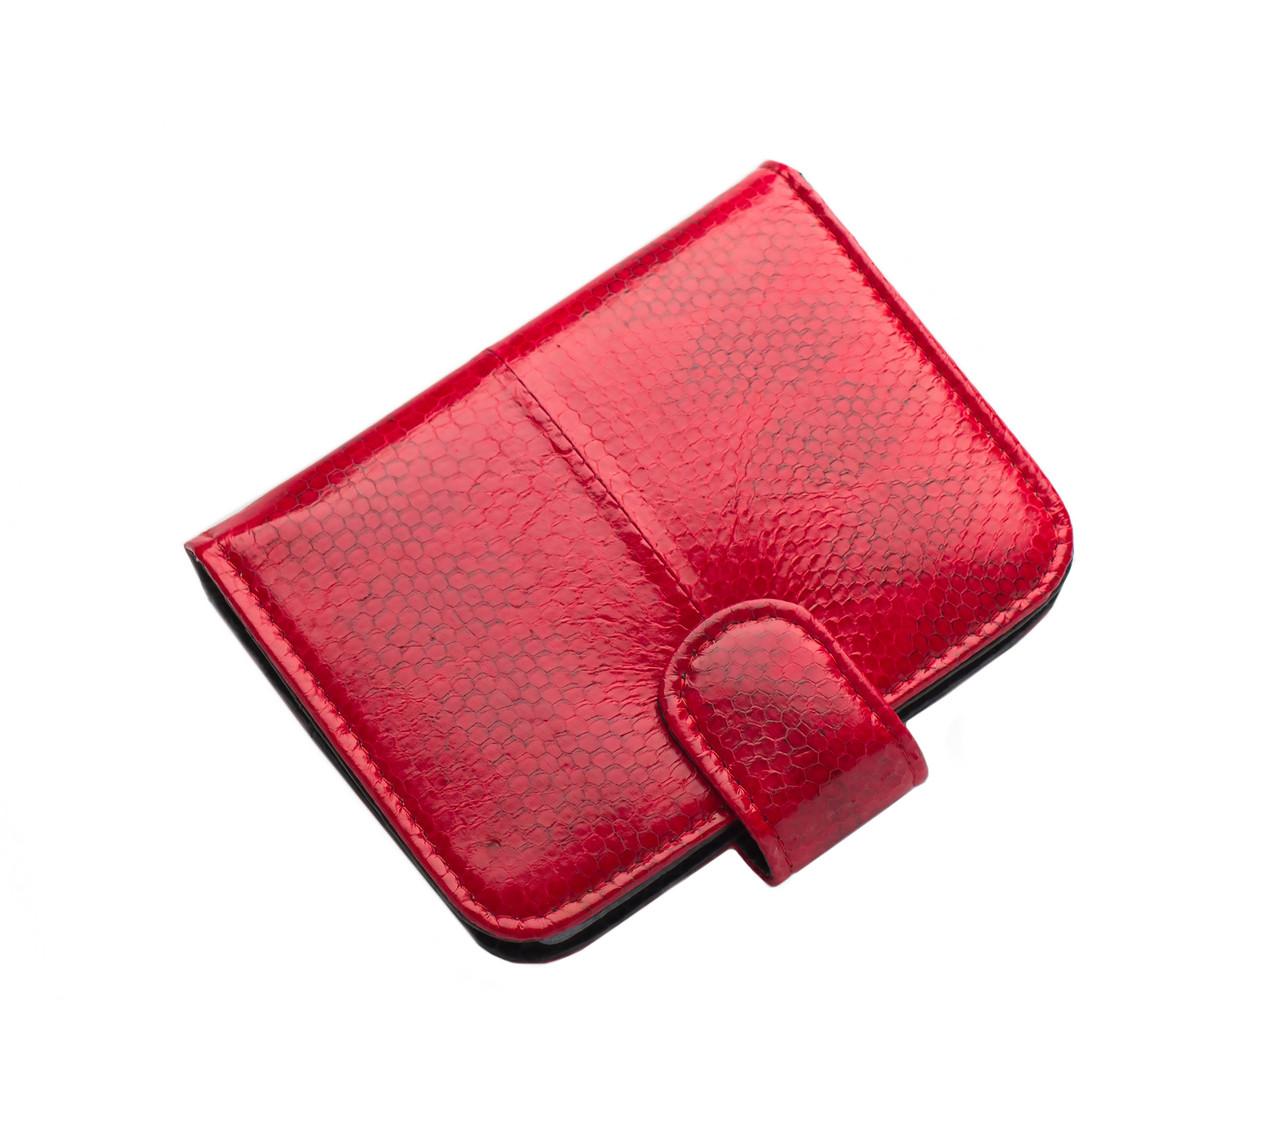 Визитница из кожи морской змеи  Ekzotic Leather Красная (snh01)